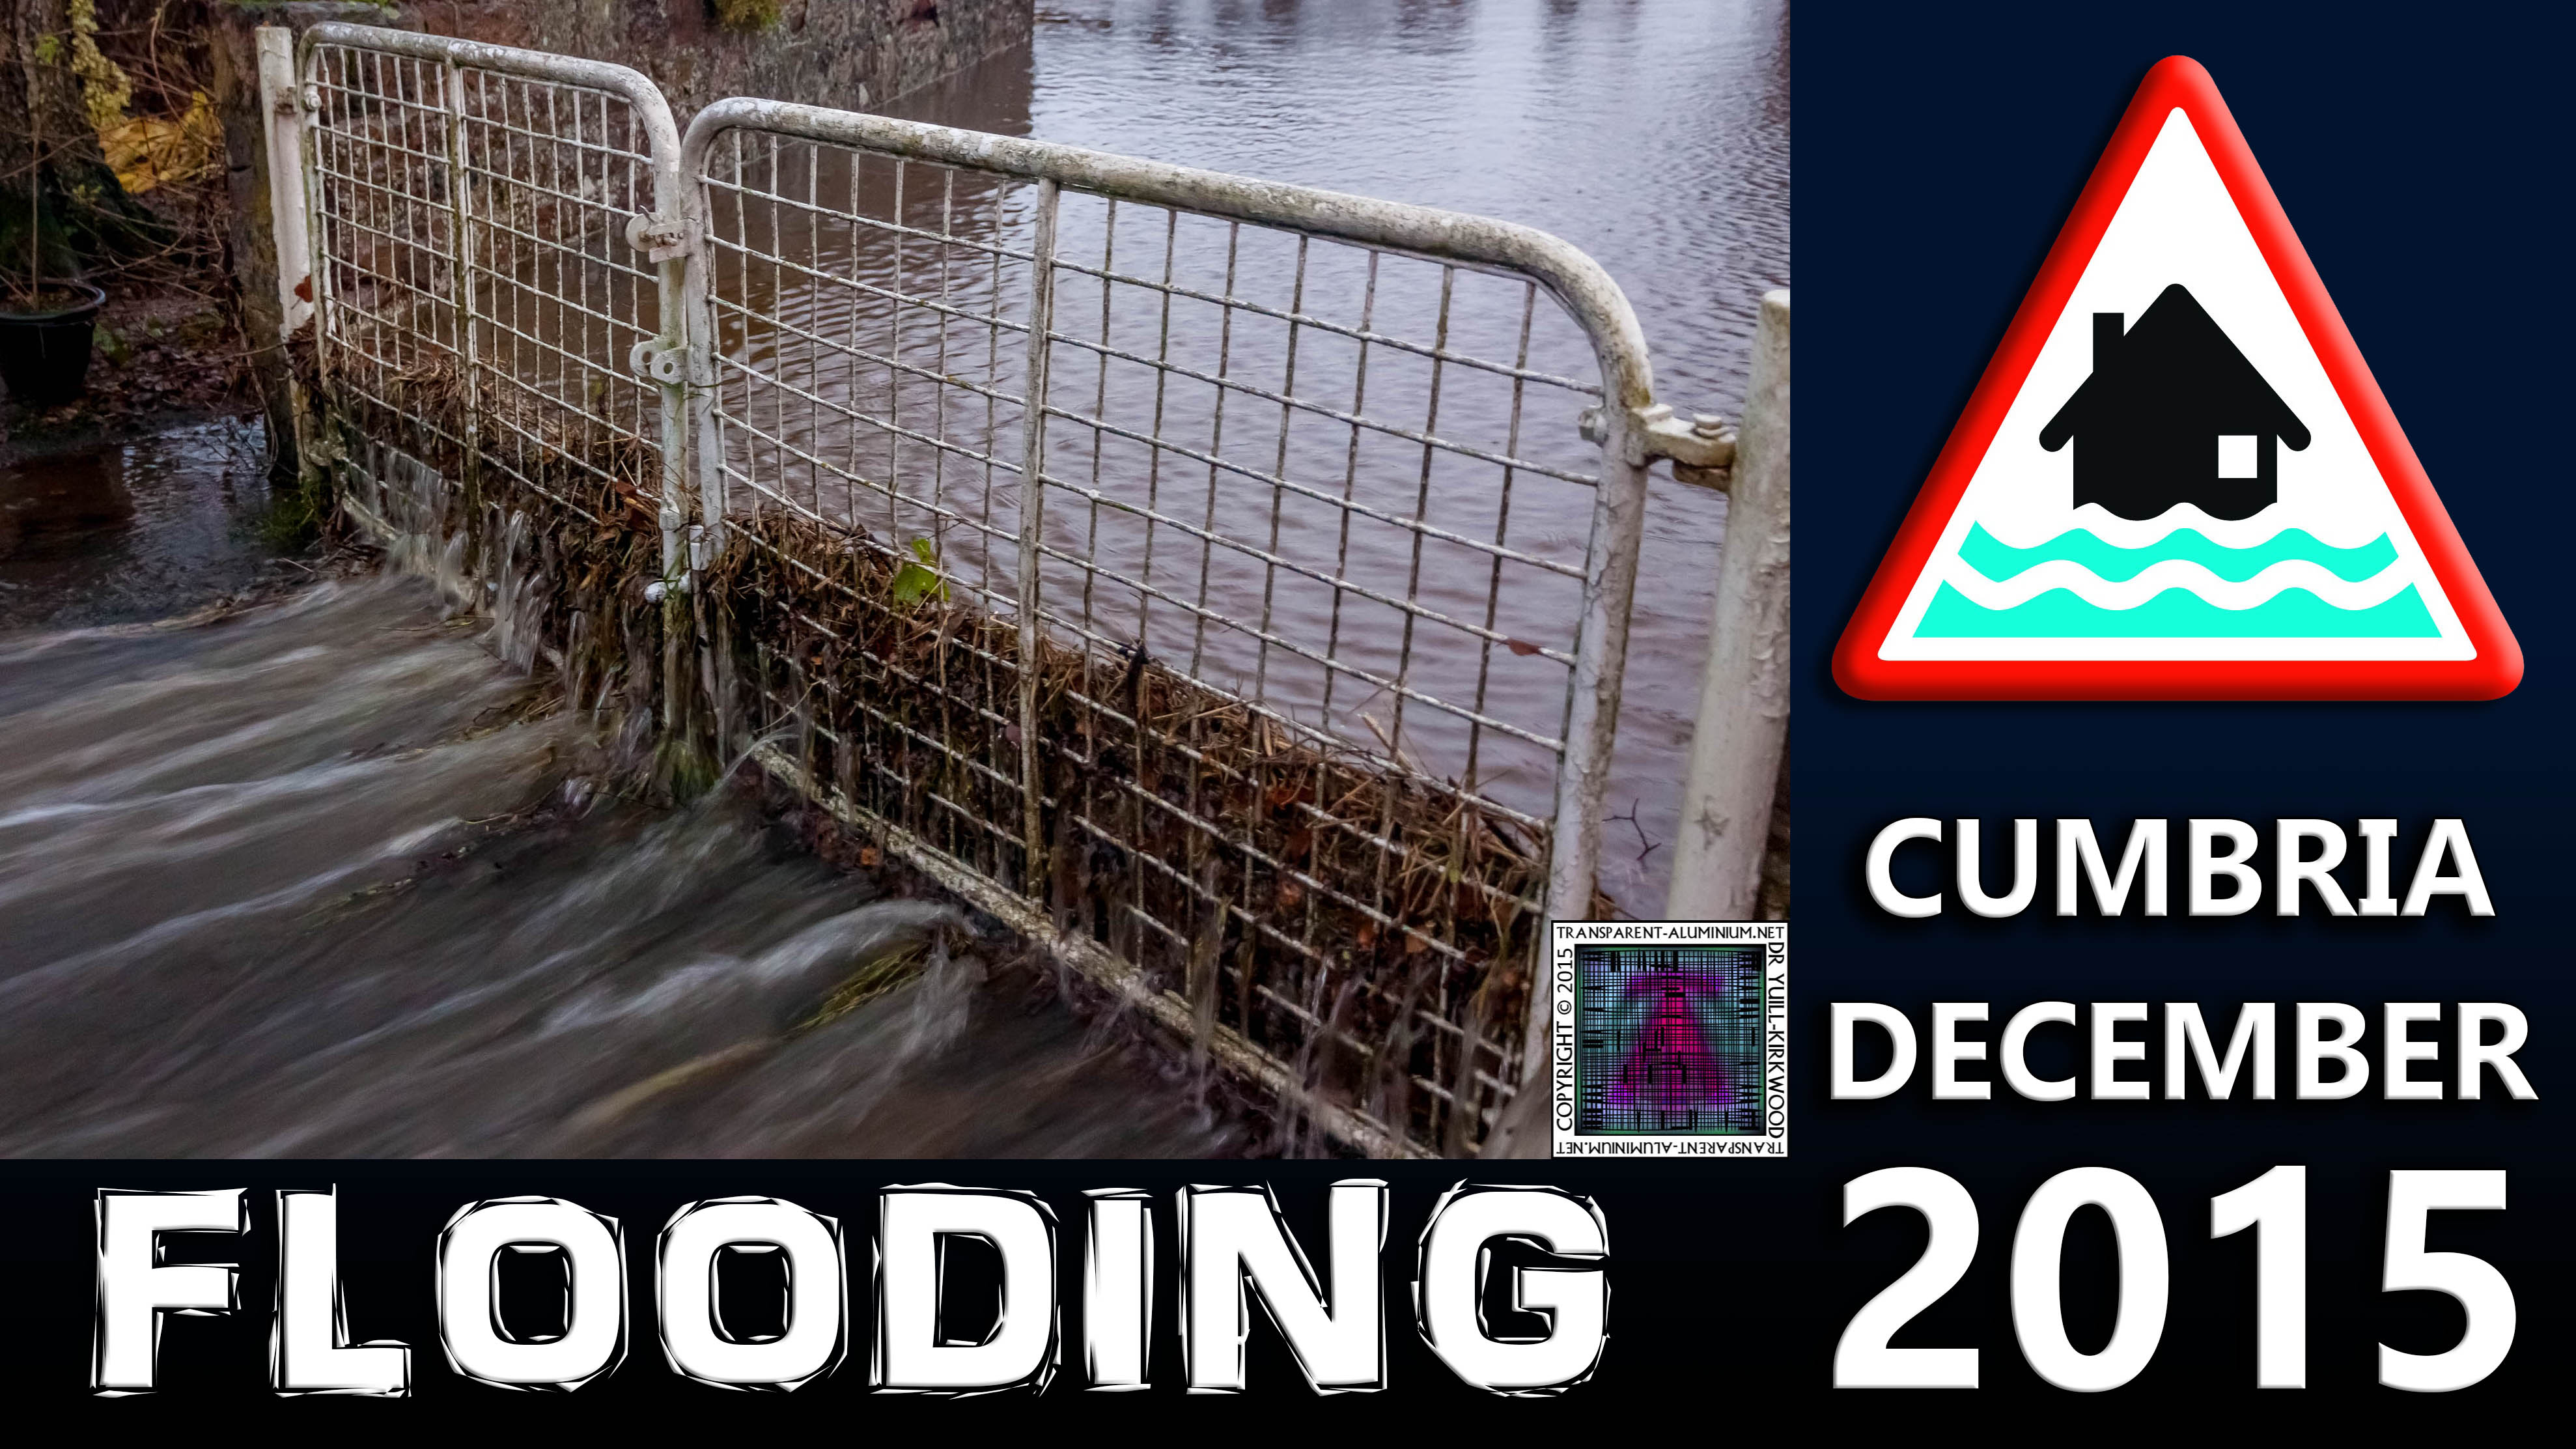 Cumbria Flooding December 2015